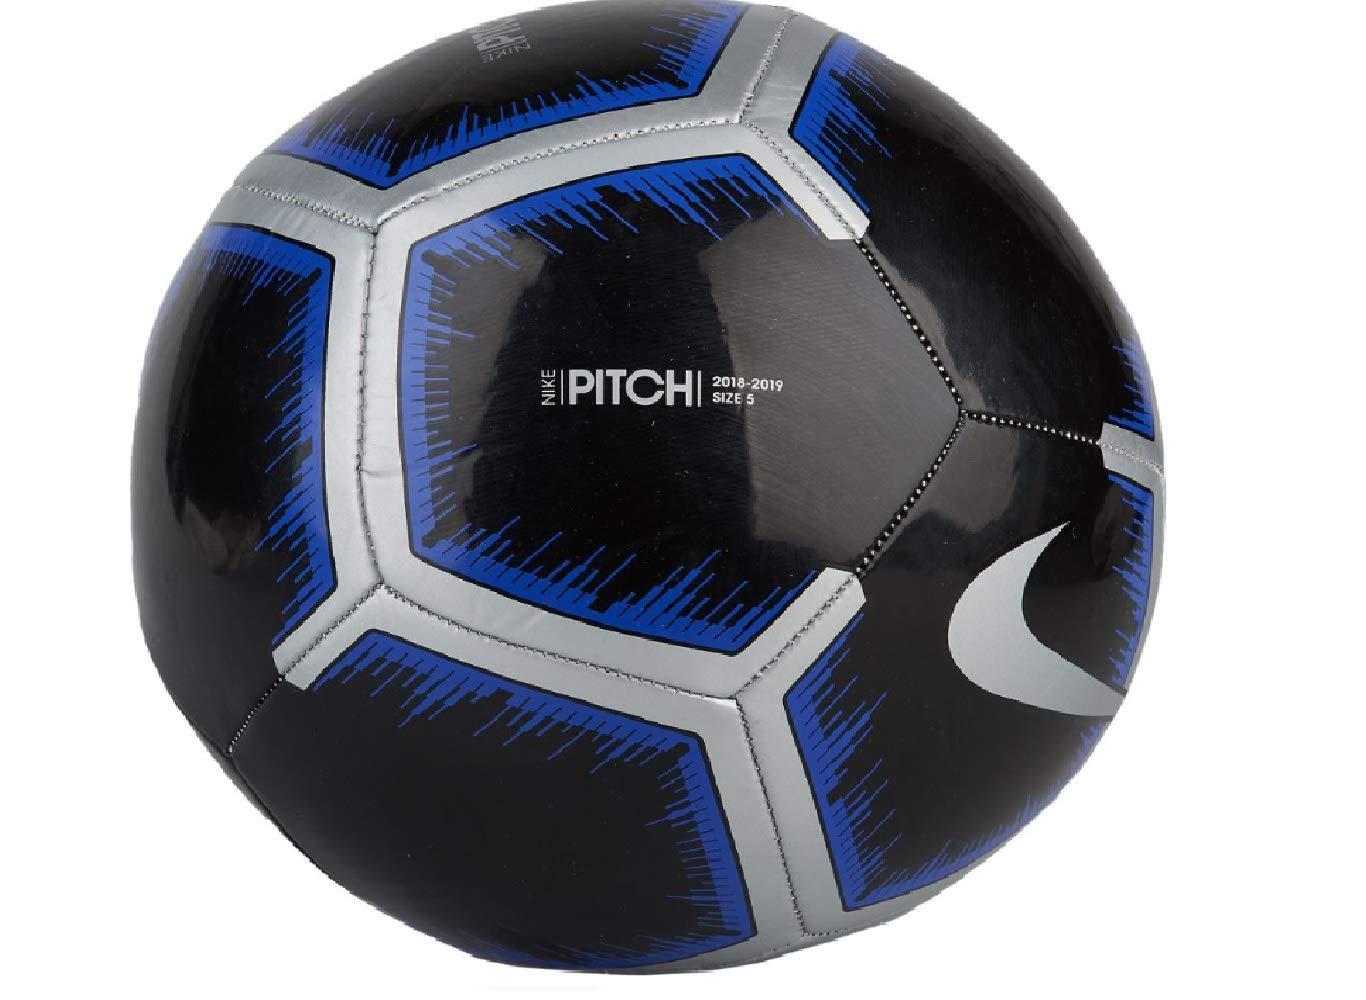 Nike Pitch Soccer Ball Black/Metallic Silver/Racer Blue Size 3